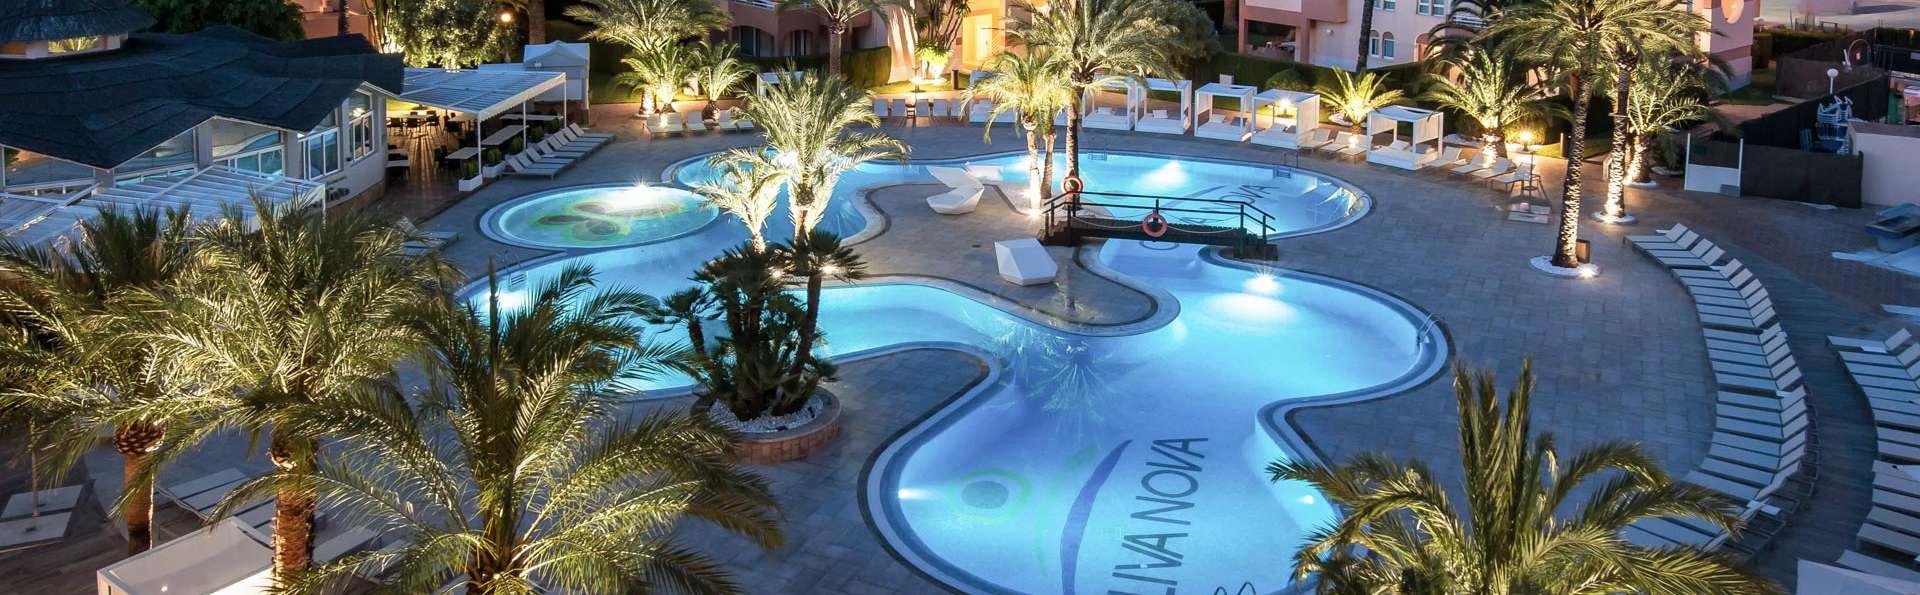 Weekend de luxe: diner dégustation, spa et cava en hotel 5* face á la mer